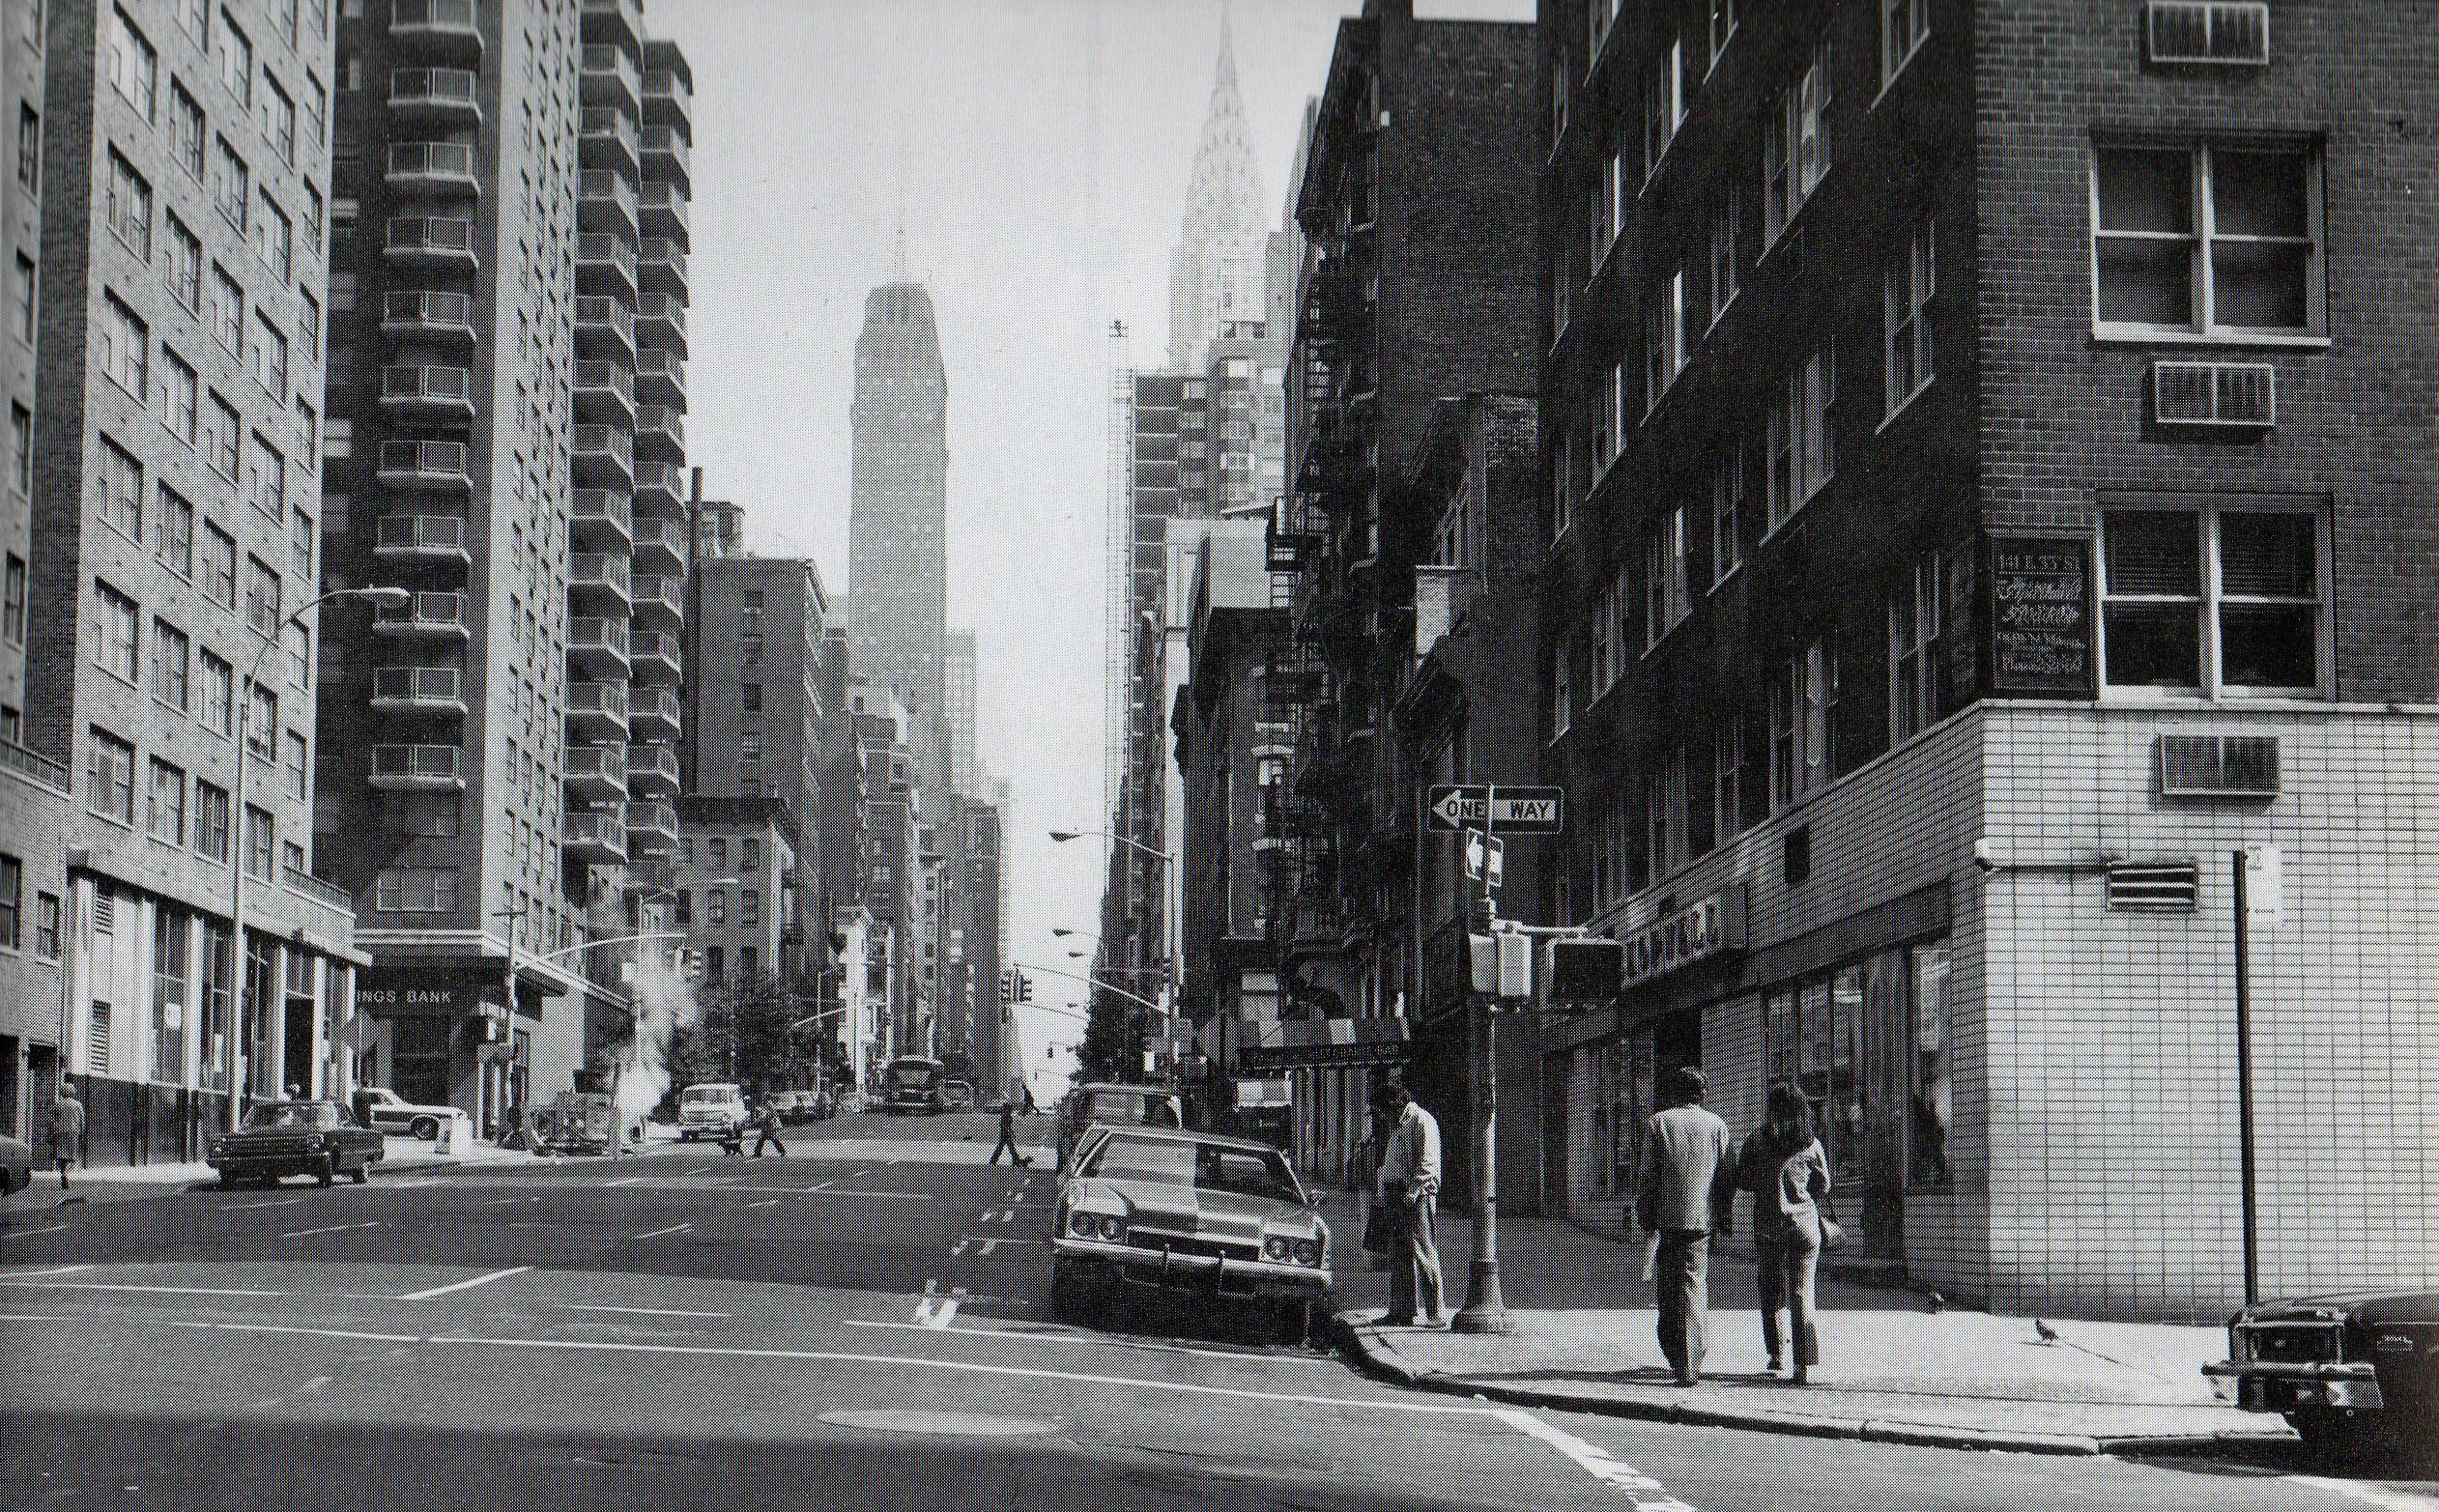 The Urban Lens: Vintage NYC photos show everyday